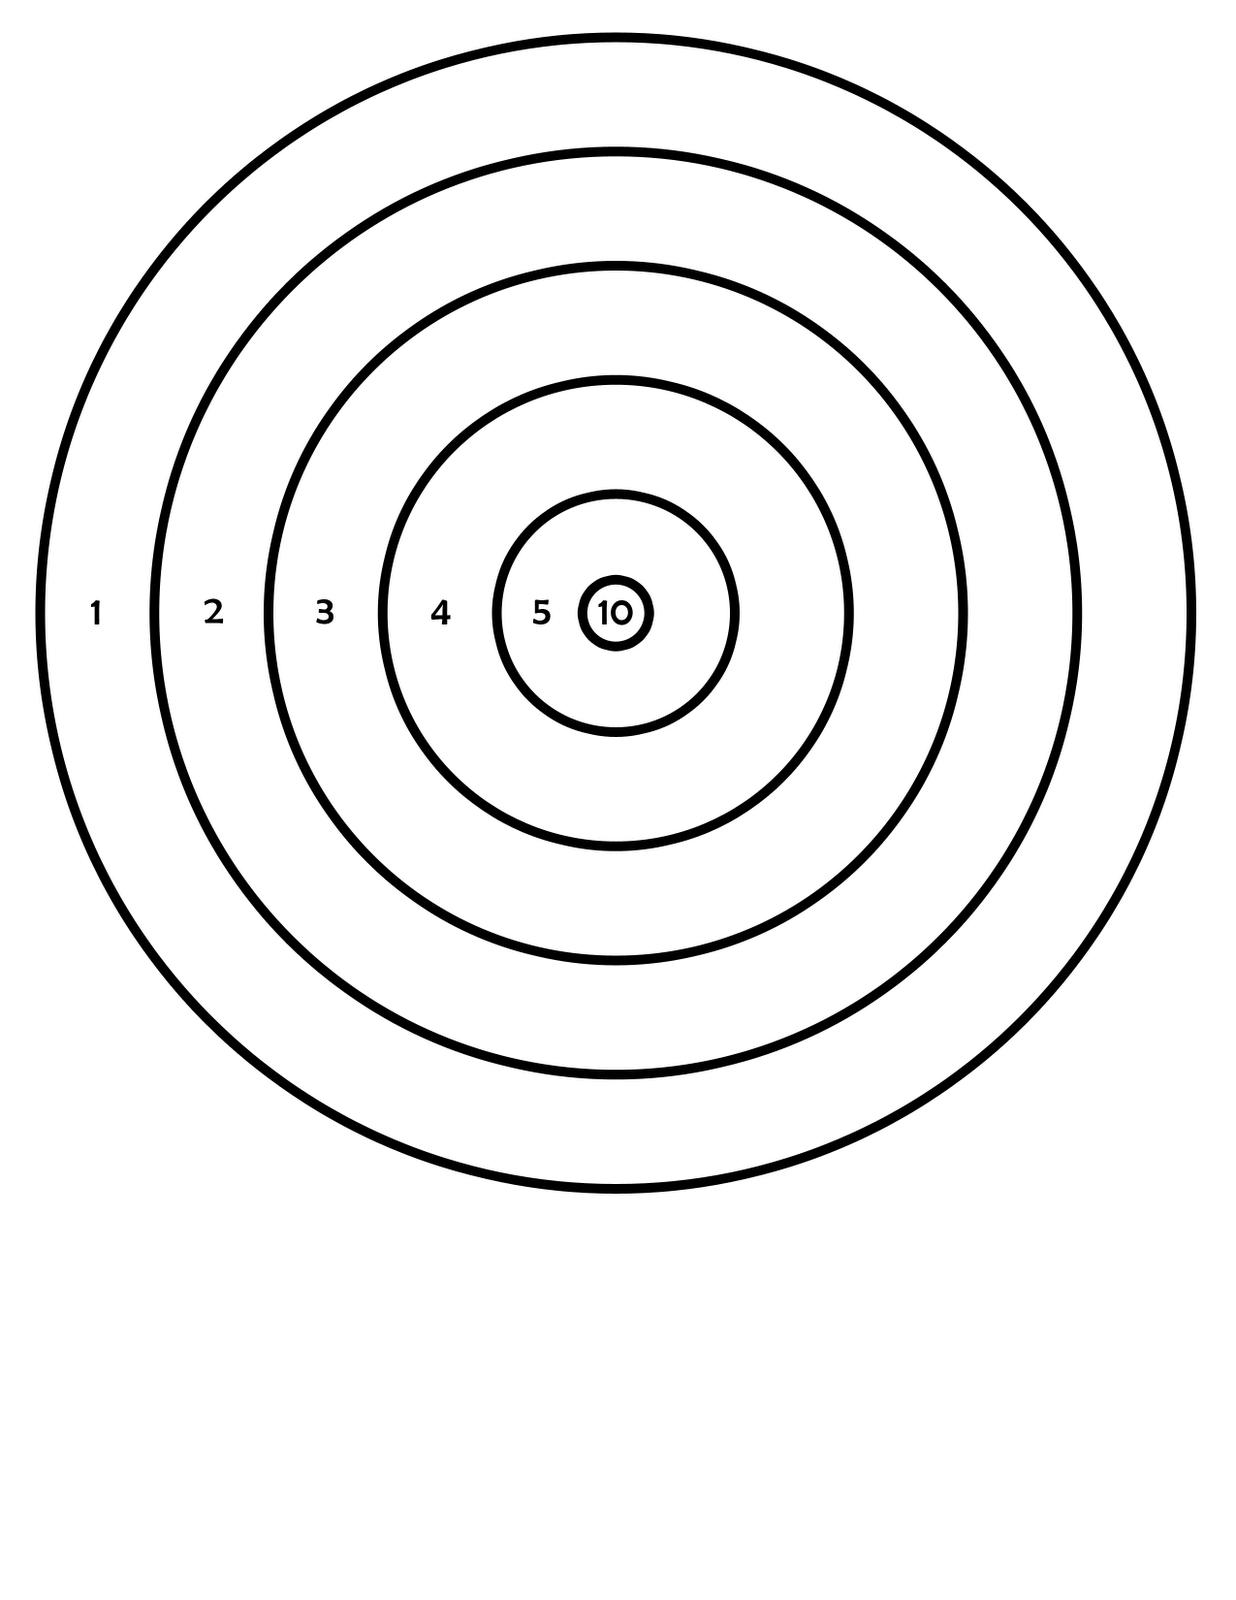 Printable Targets | 411Toys: Free Printable Airsoft Targets - Free Printable Targets